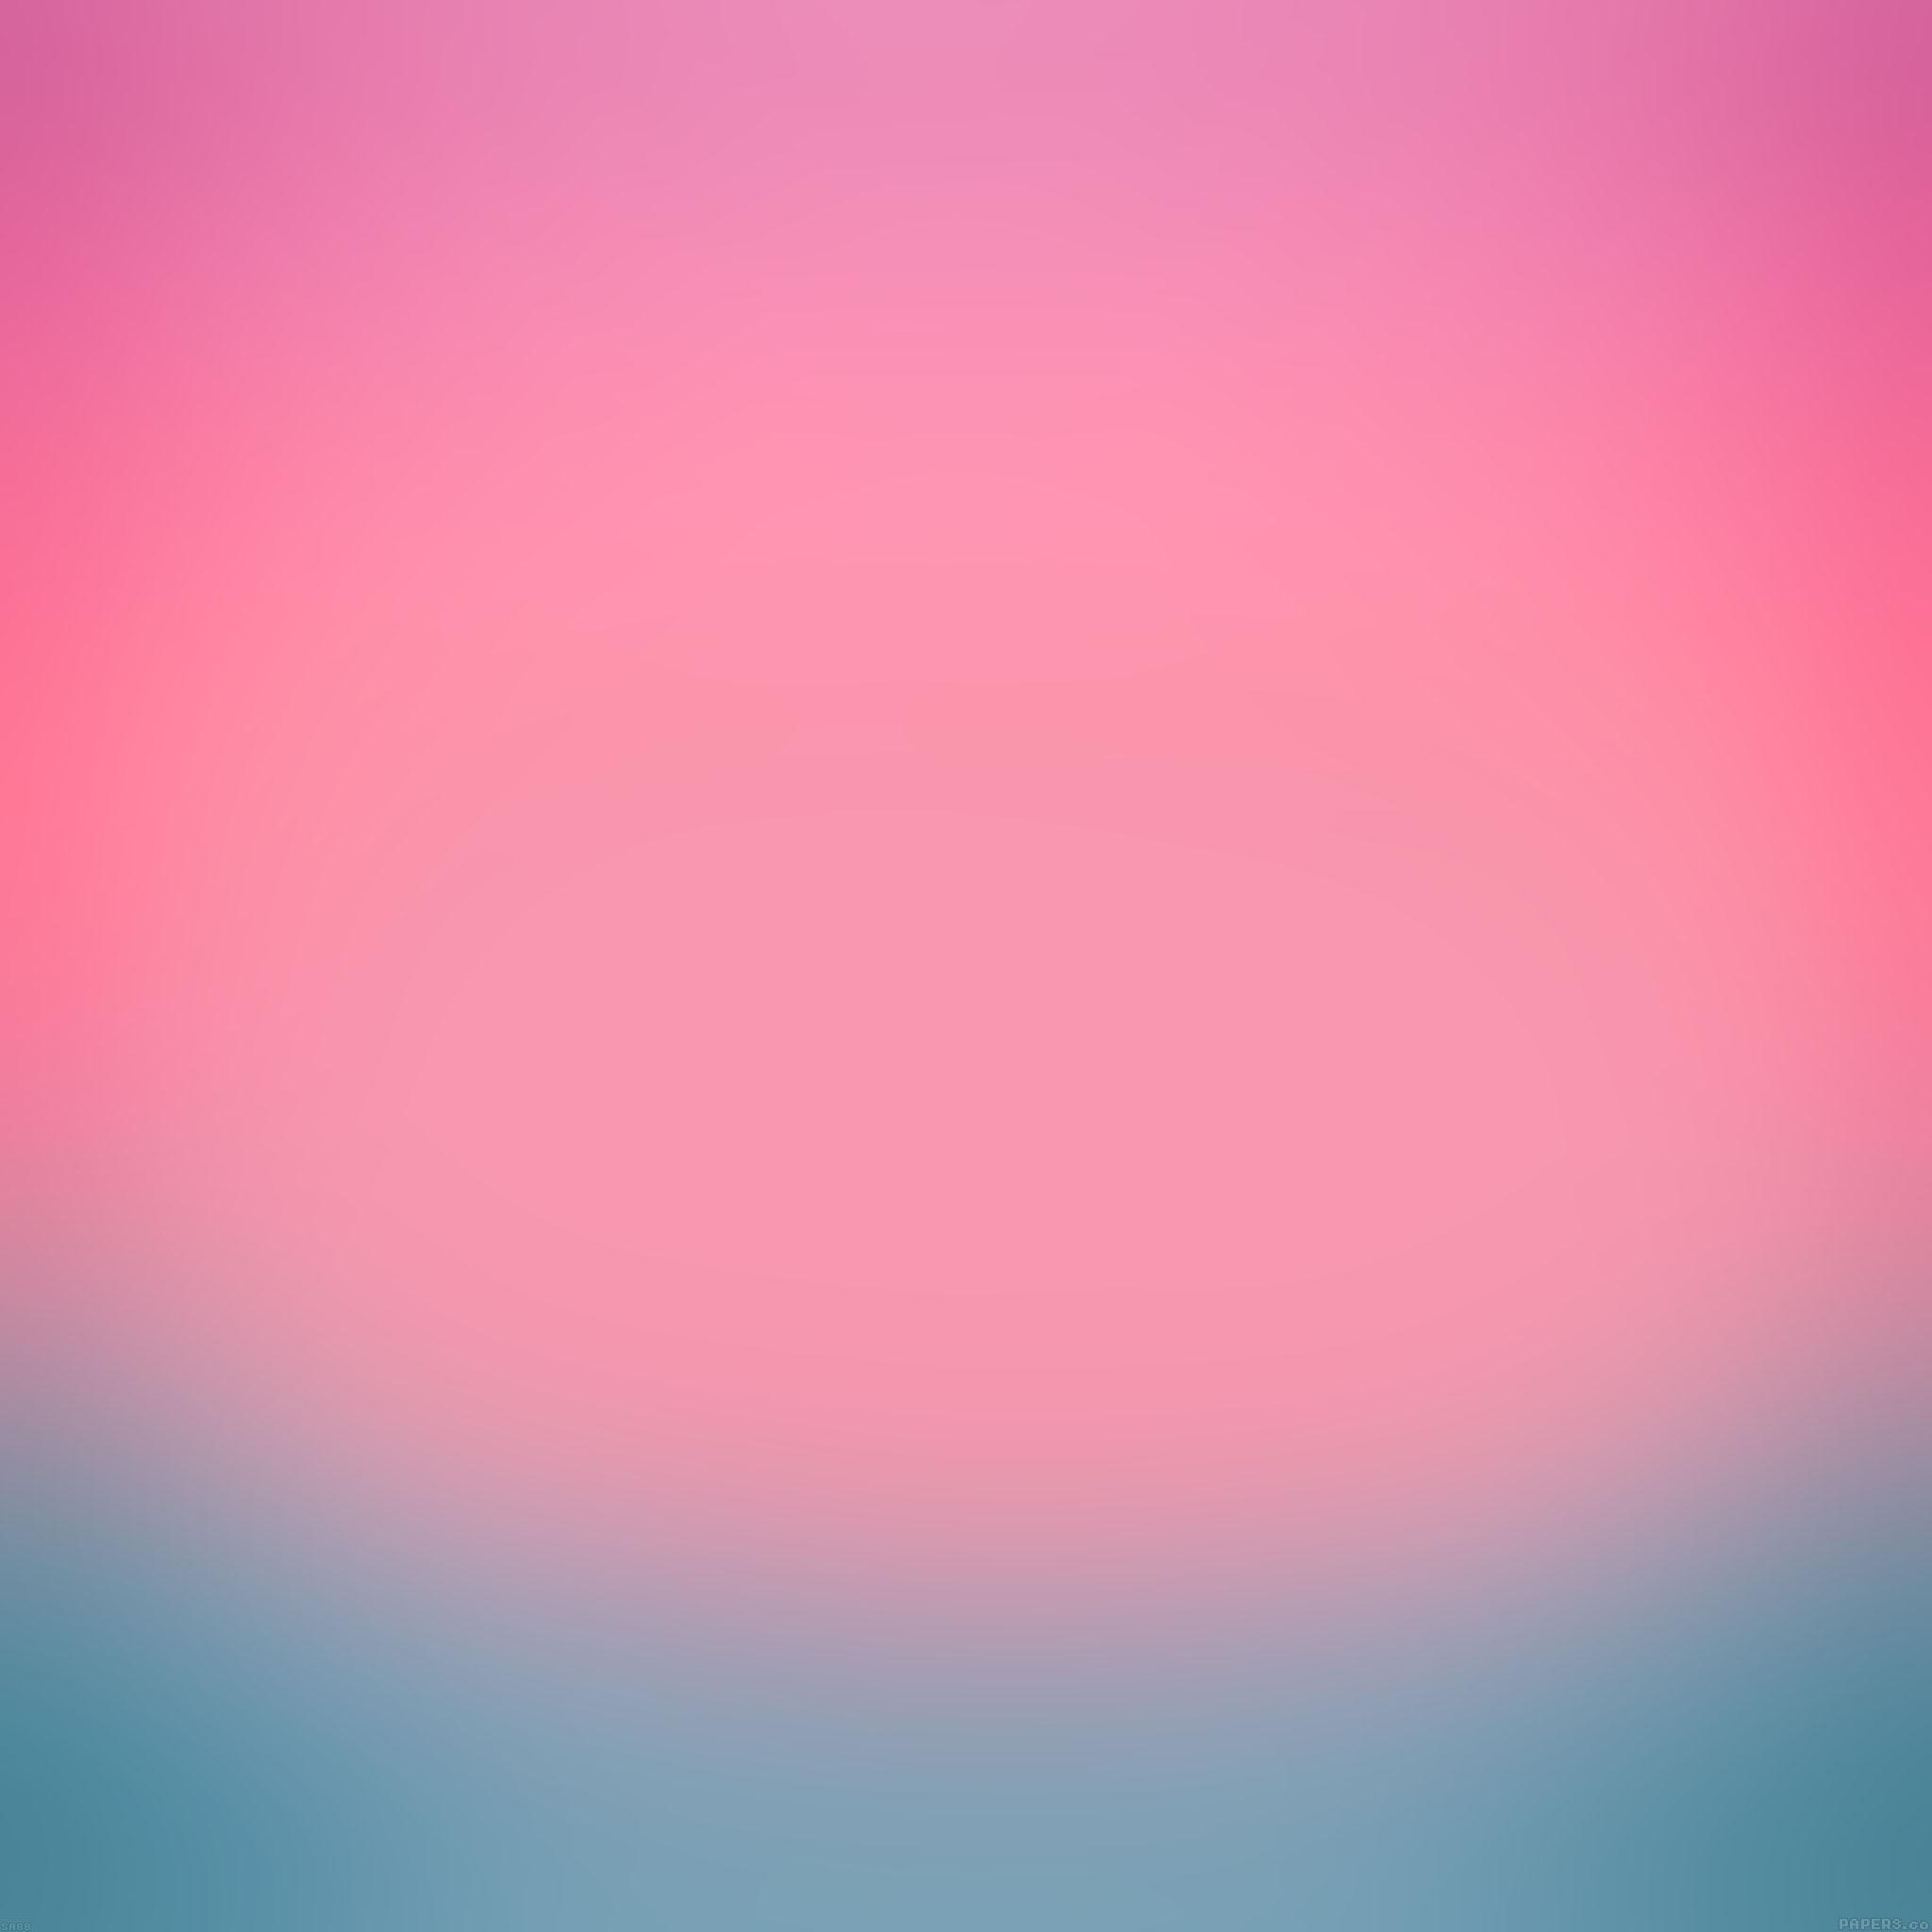 Wallpaper Iphone Violet: Sa88-wallpaper-violet-nail-blur - Parallax HD